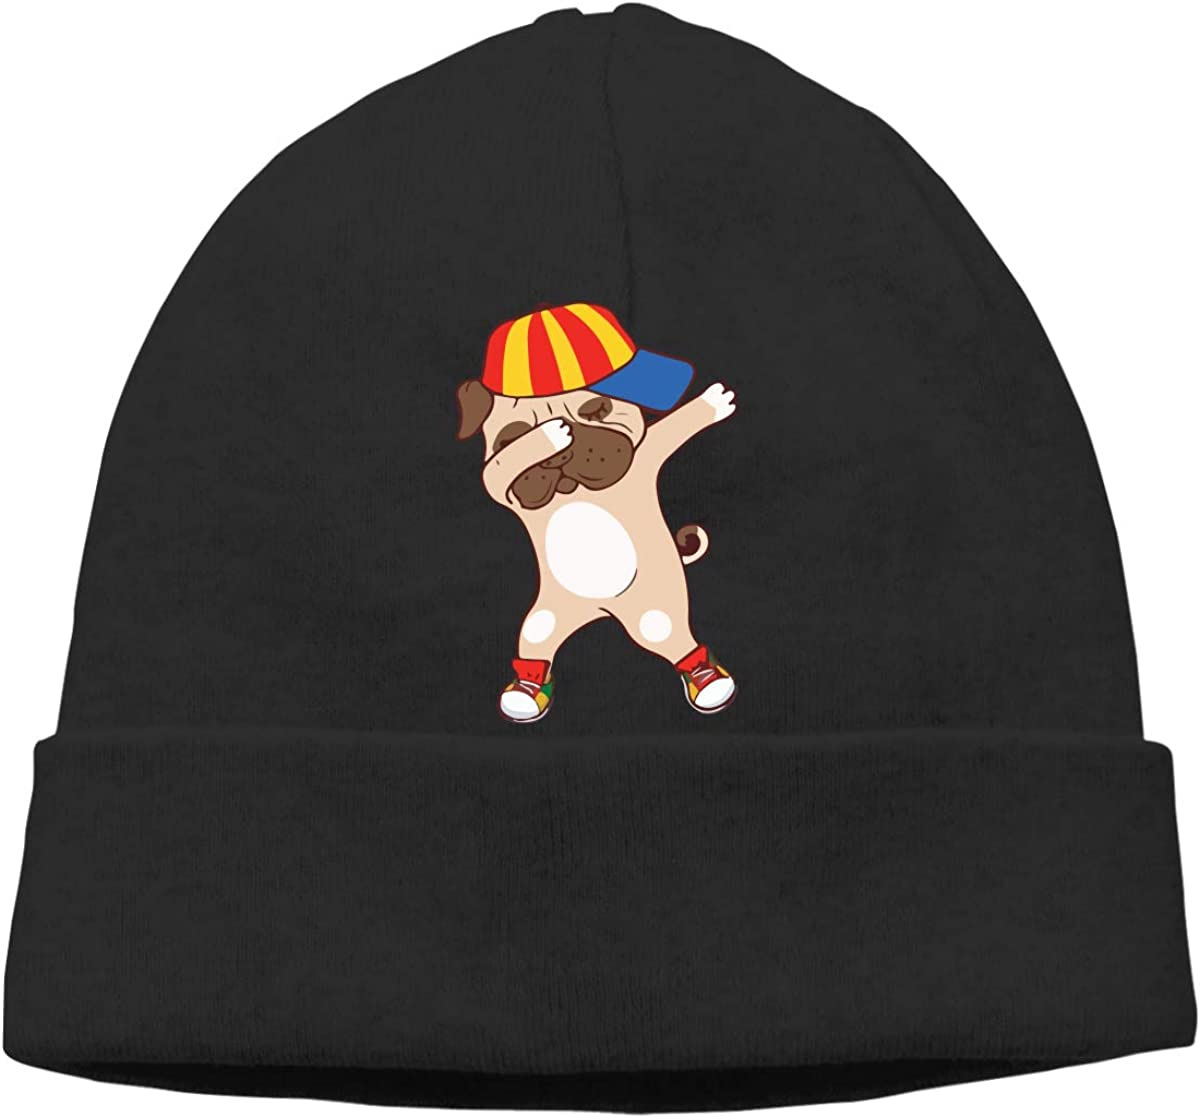 GDSG5/&4 Funny Pug Dabbing Dad Hip Hop Dog Unisex Great Thermal Running Beanie Hats